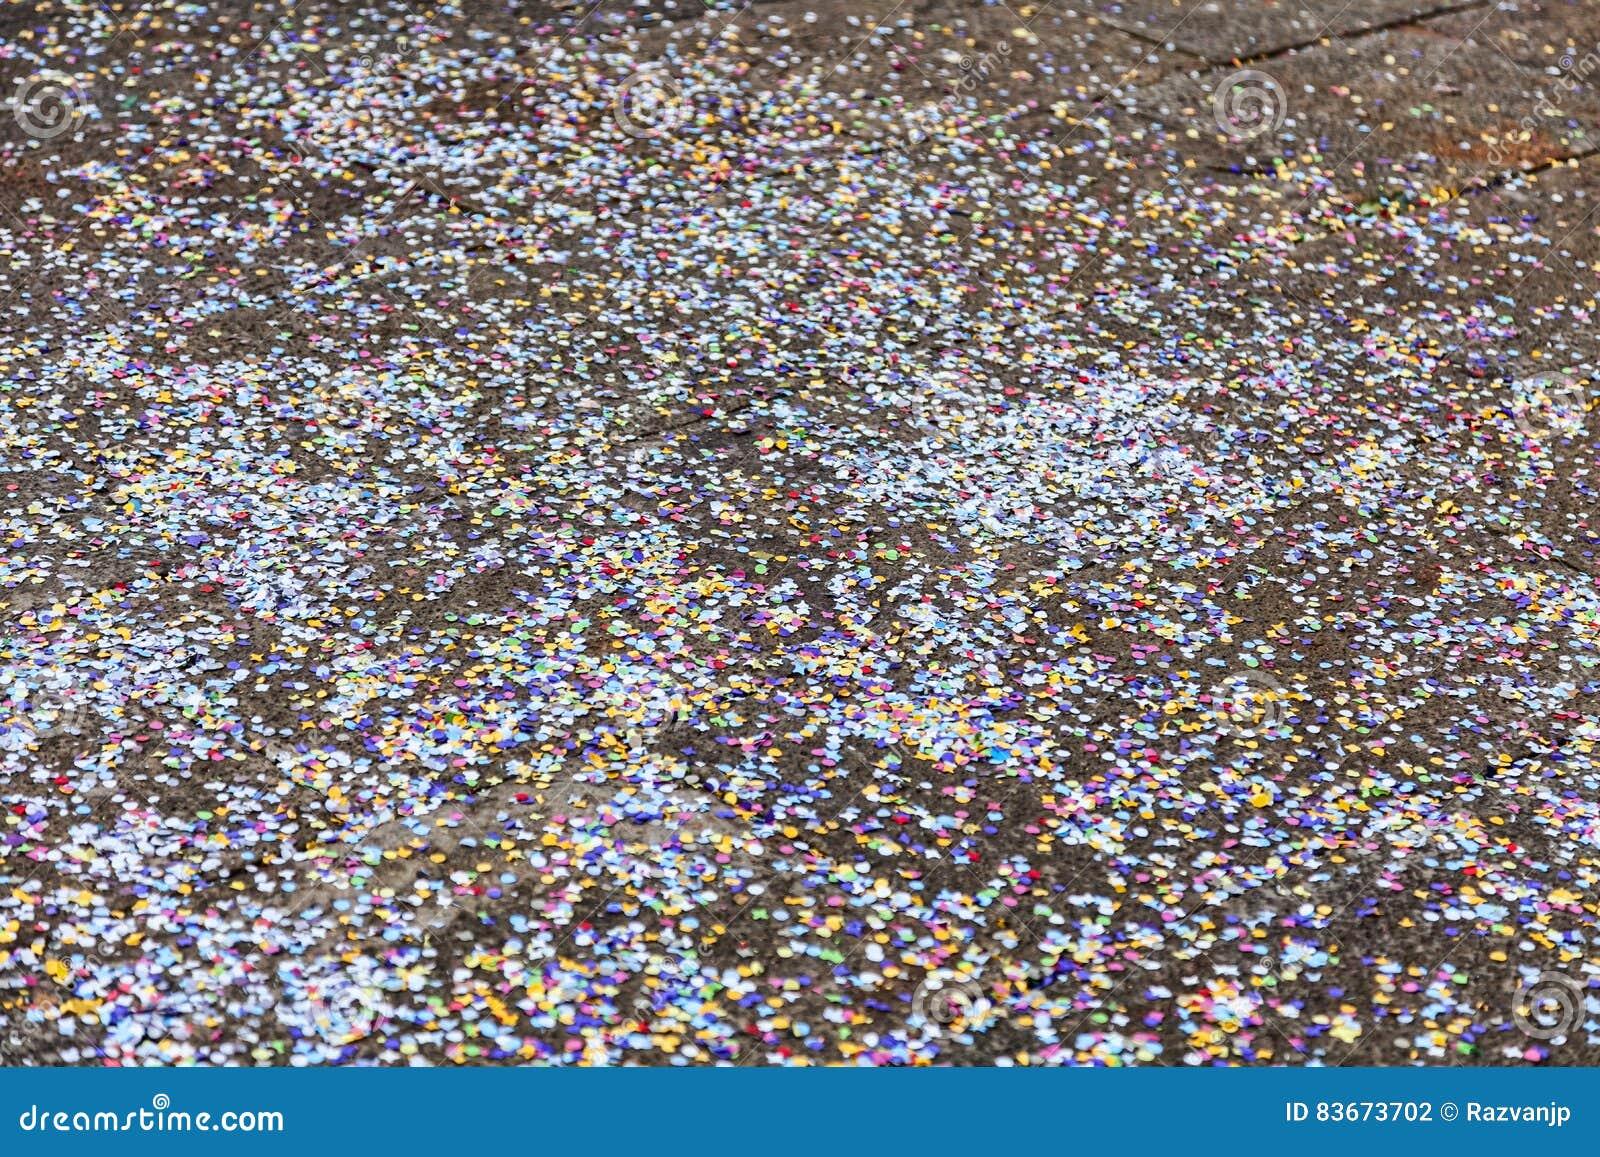 Confettis sur la rue